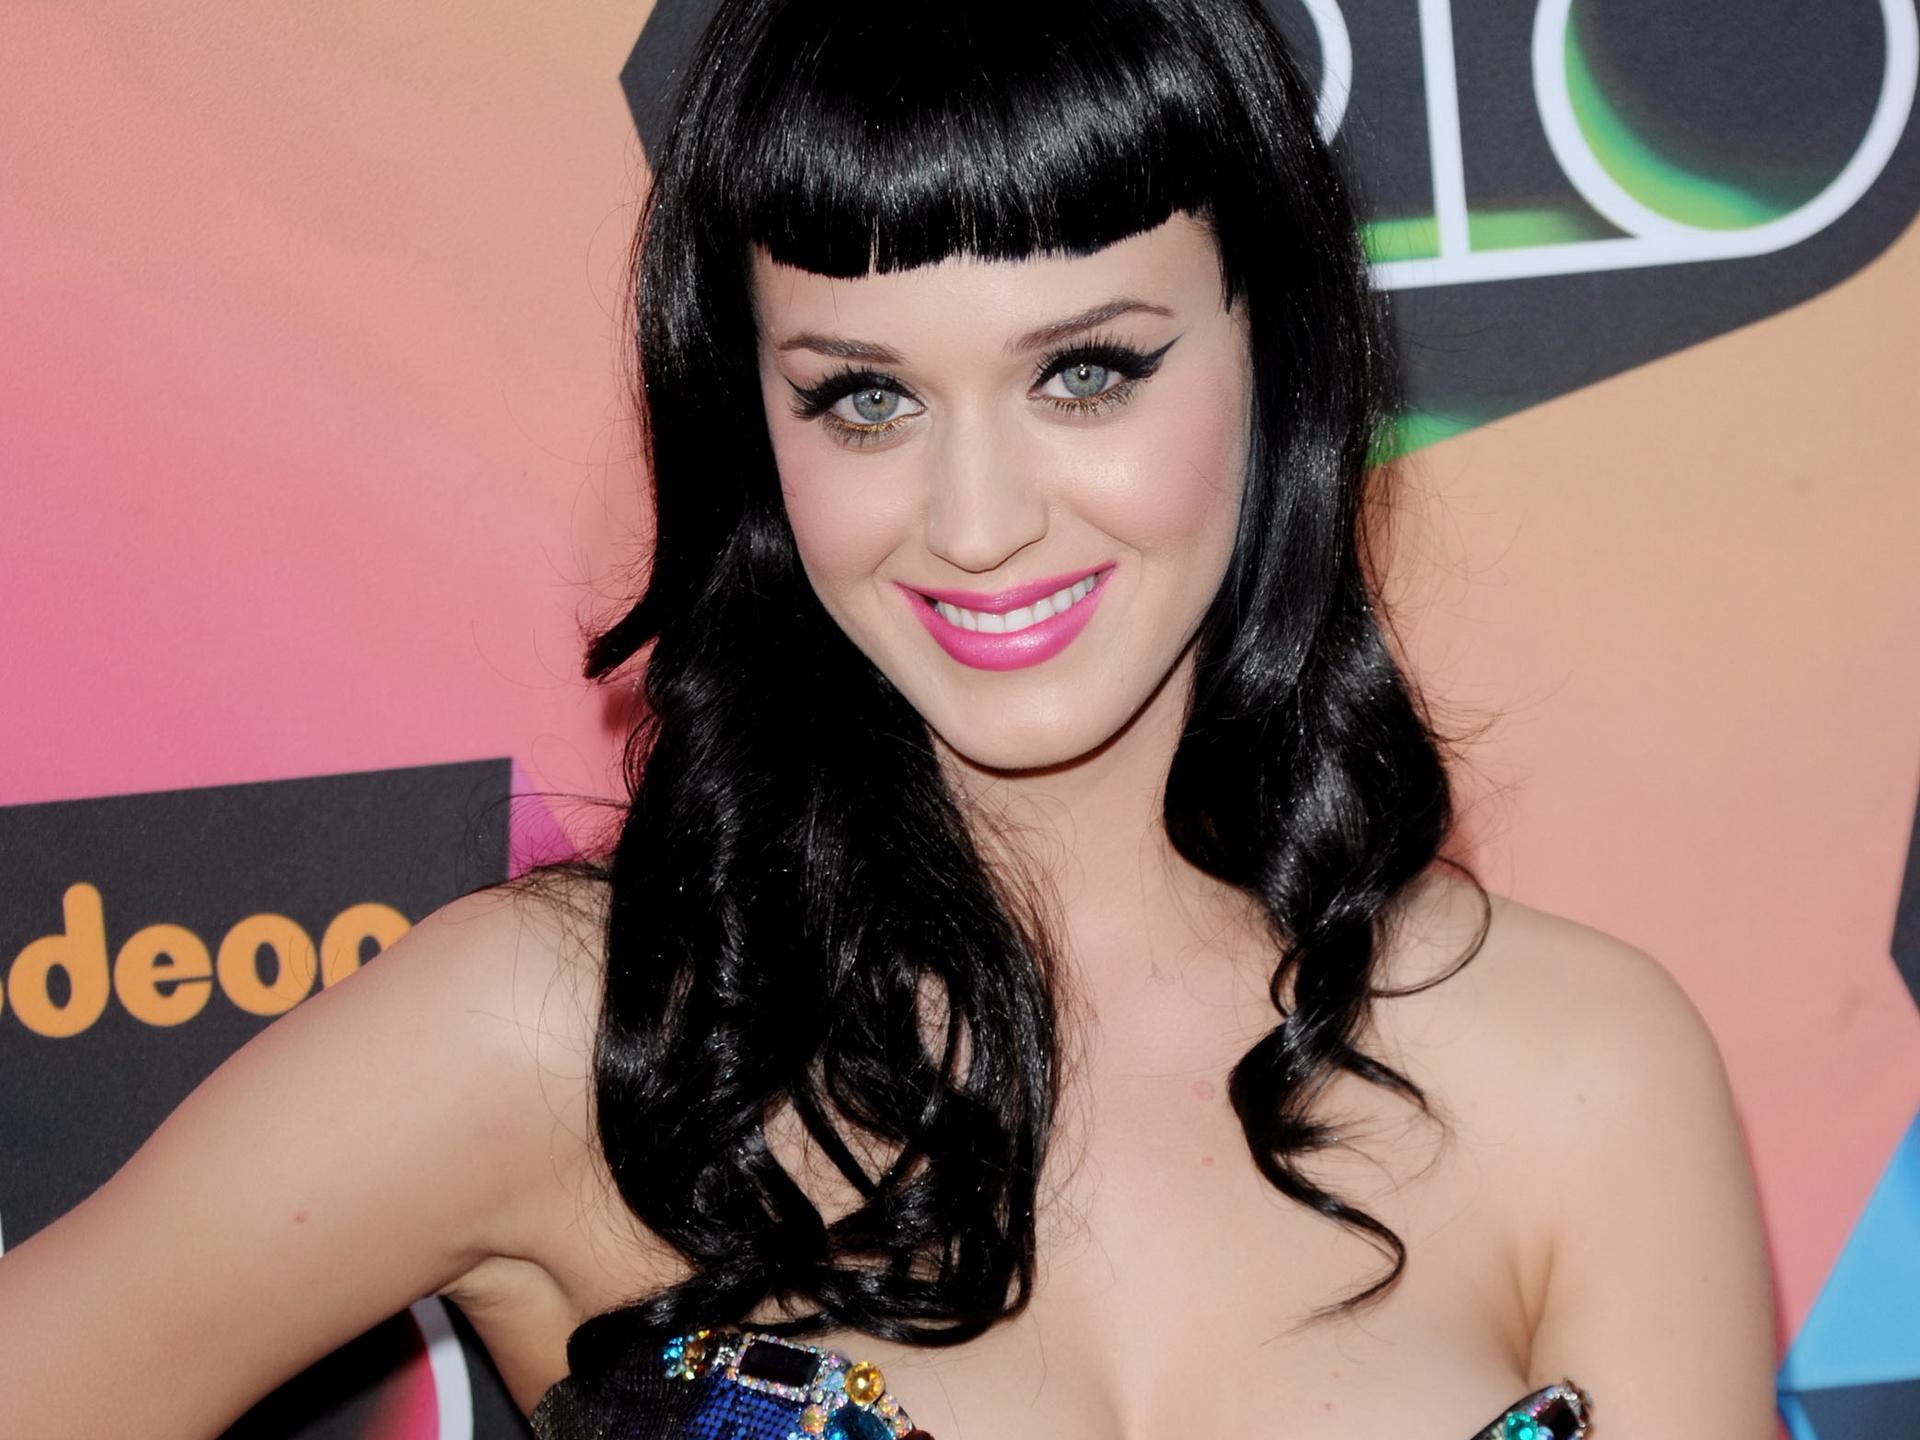 Katy Perry vuole diventare attrice, dopo HIMYM 6 apparirà in Grey's Anatomy 9?